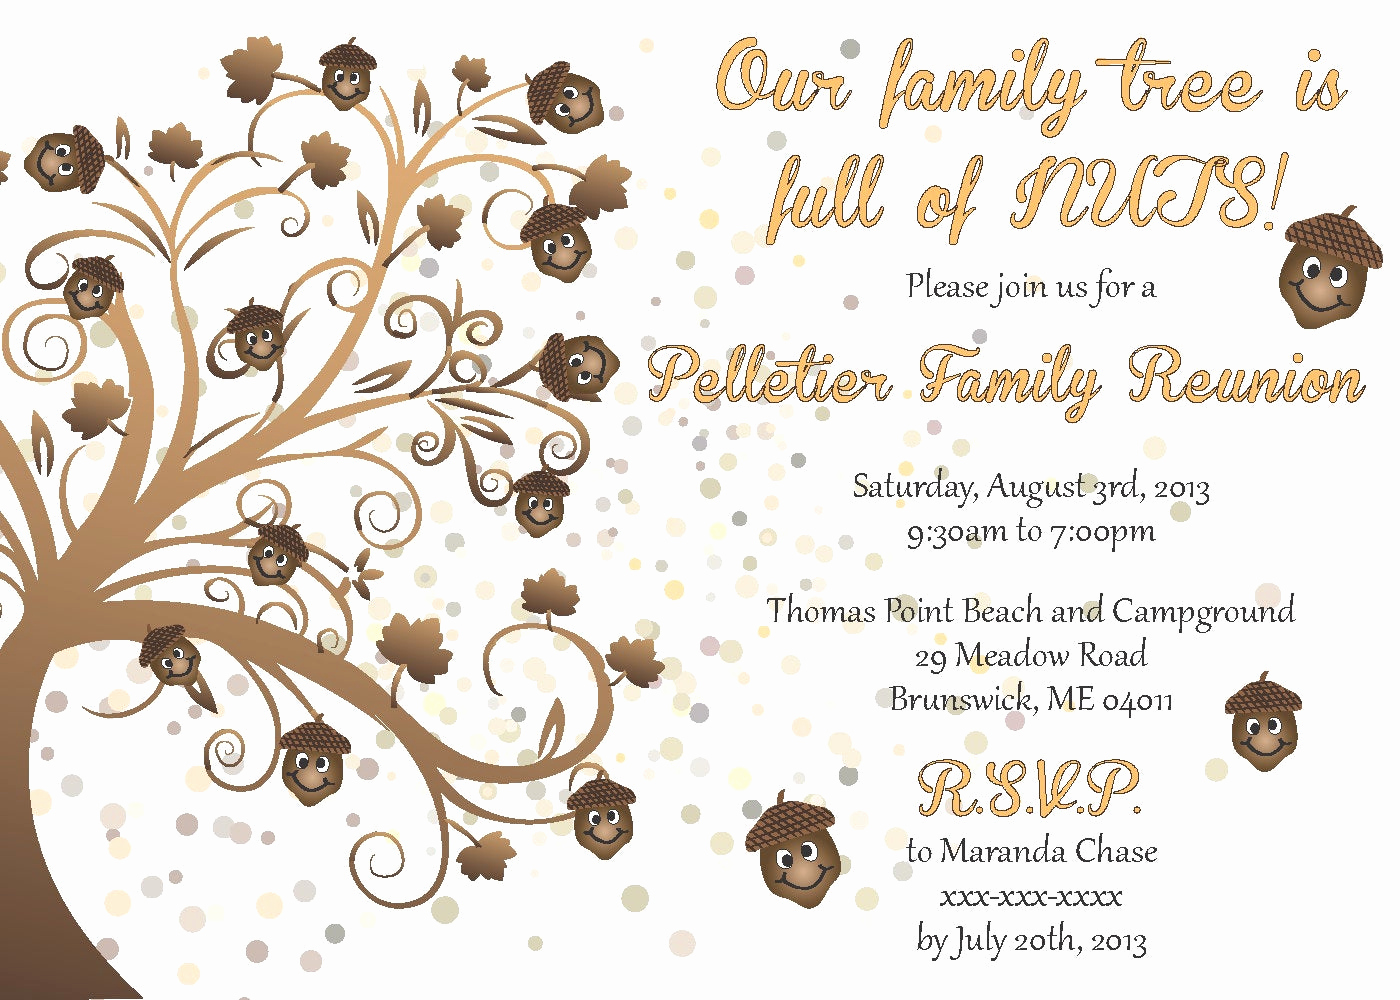 Family Reunion Invitation Wording Beautiful Family Reunion Invitation by Littlebopress On Etsy